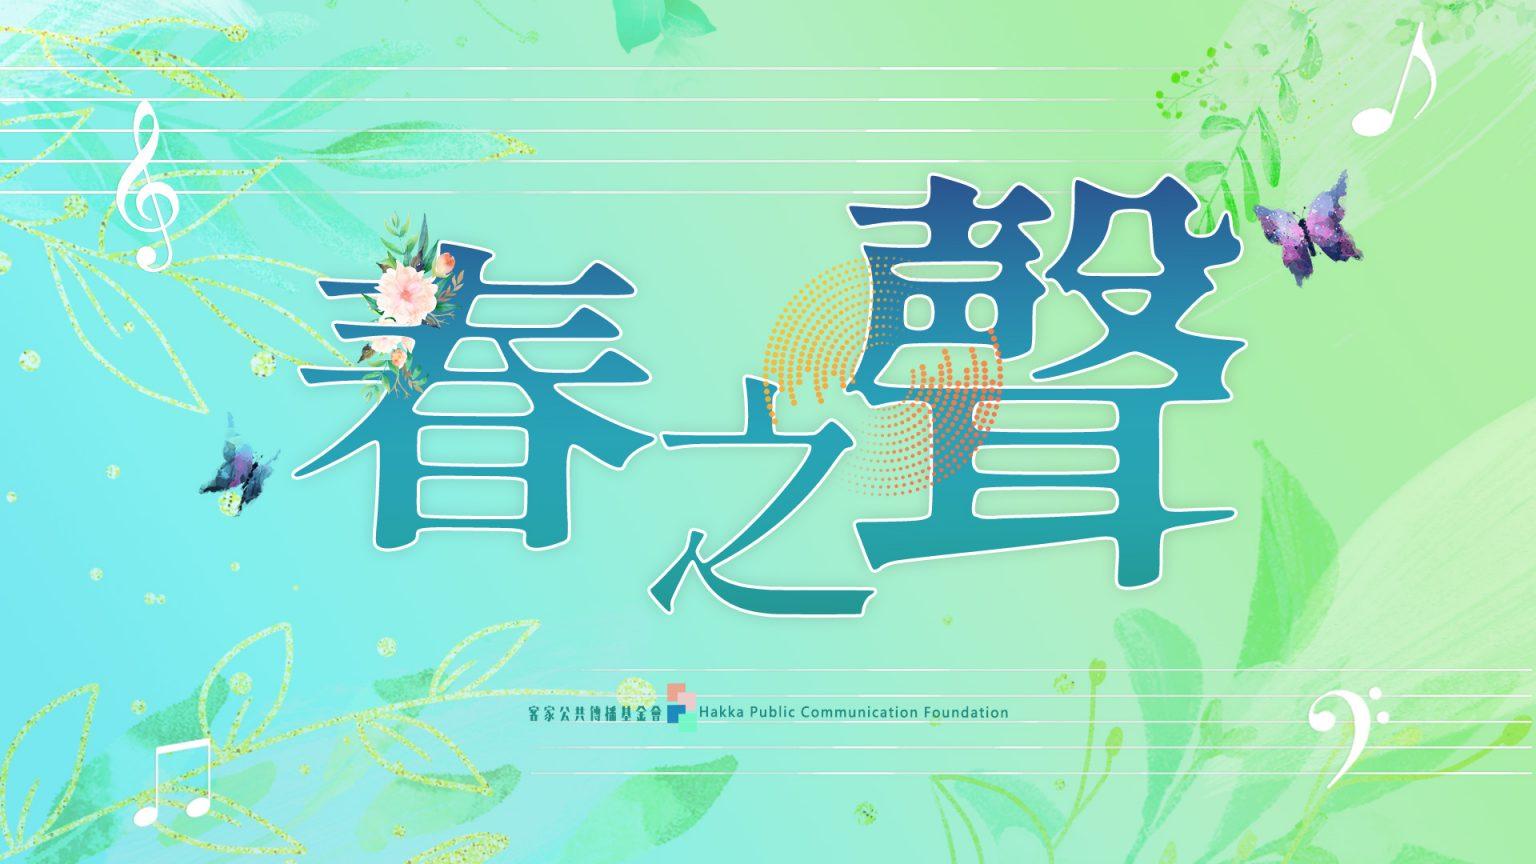 Read more about the article 3/19 (五)《春之聲》客家流行創作歌曲音樂會,邀您共下享受春天音樂饗宴!